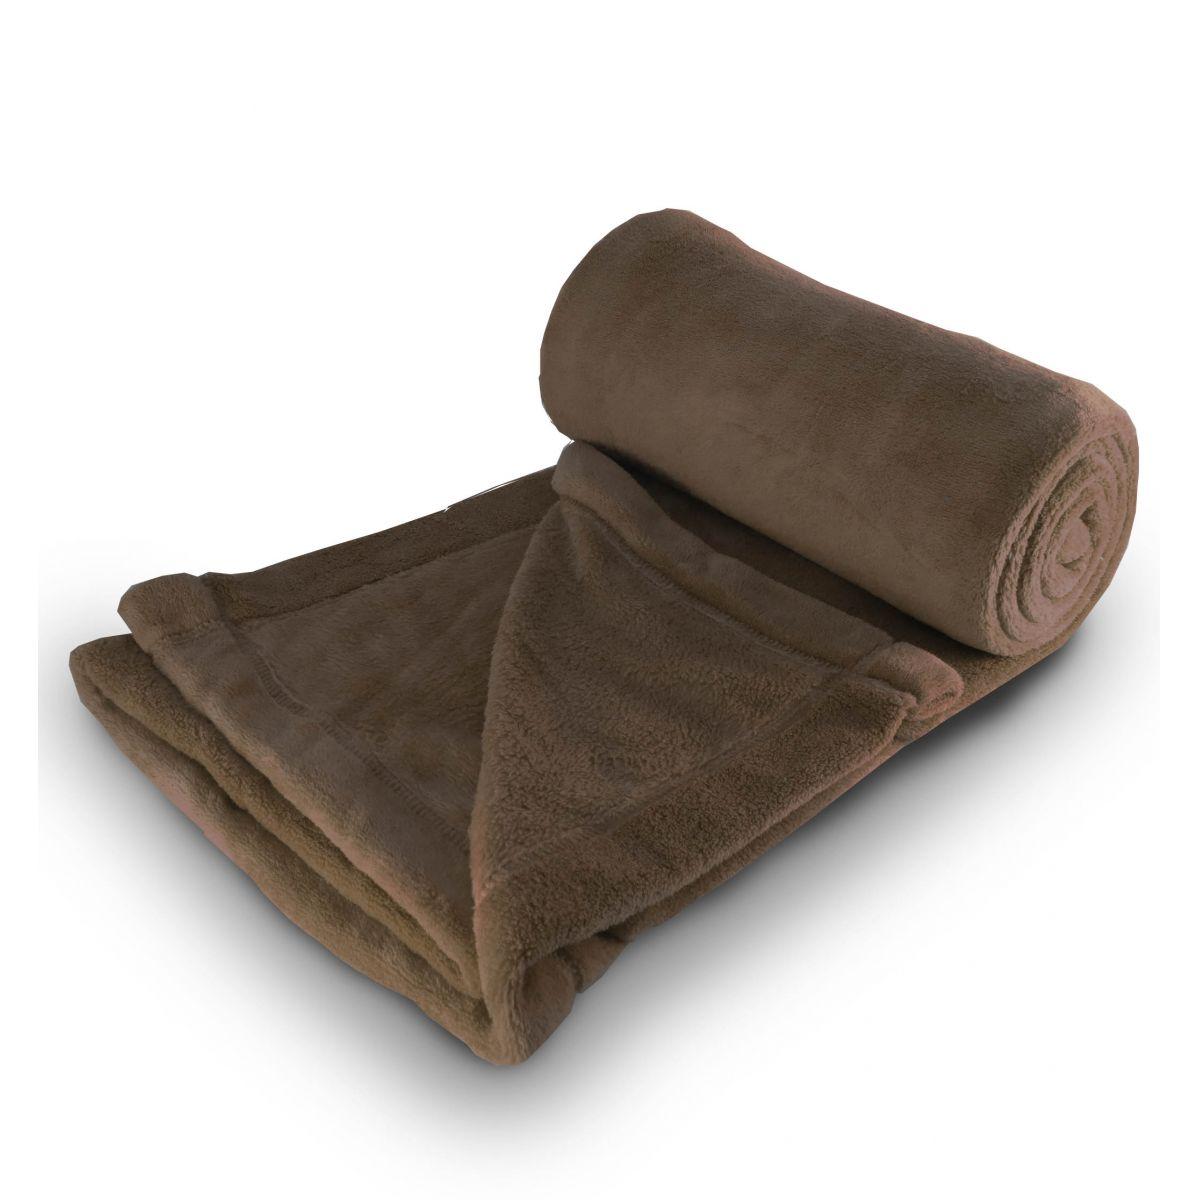 Cobertor de Microfibra Casal - Marrom